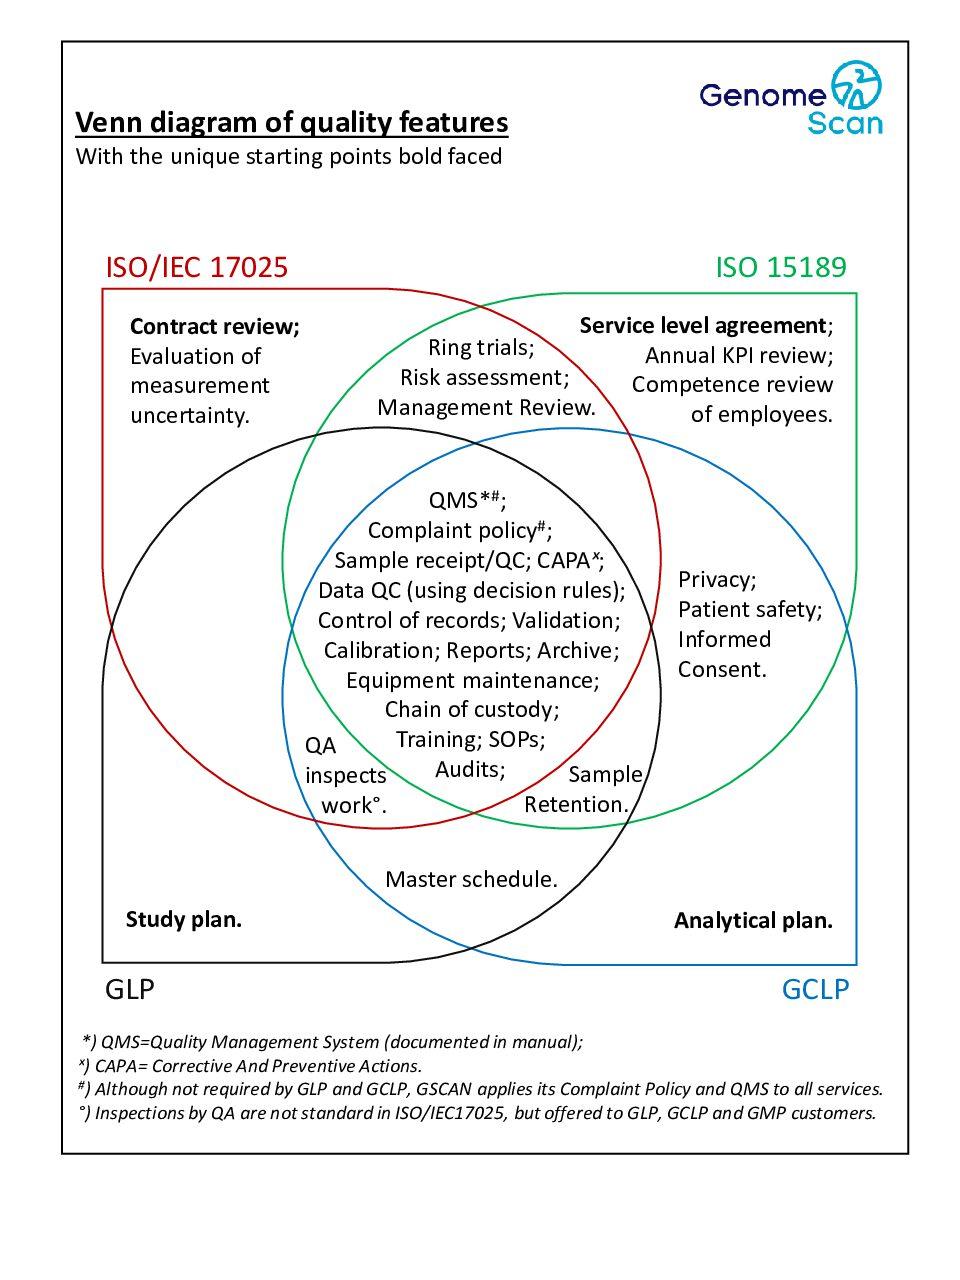 GS2021 Venn Diagram 1 pdf Menu page   Quality and competence